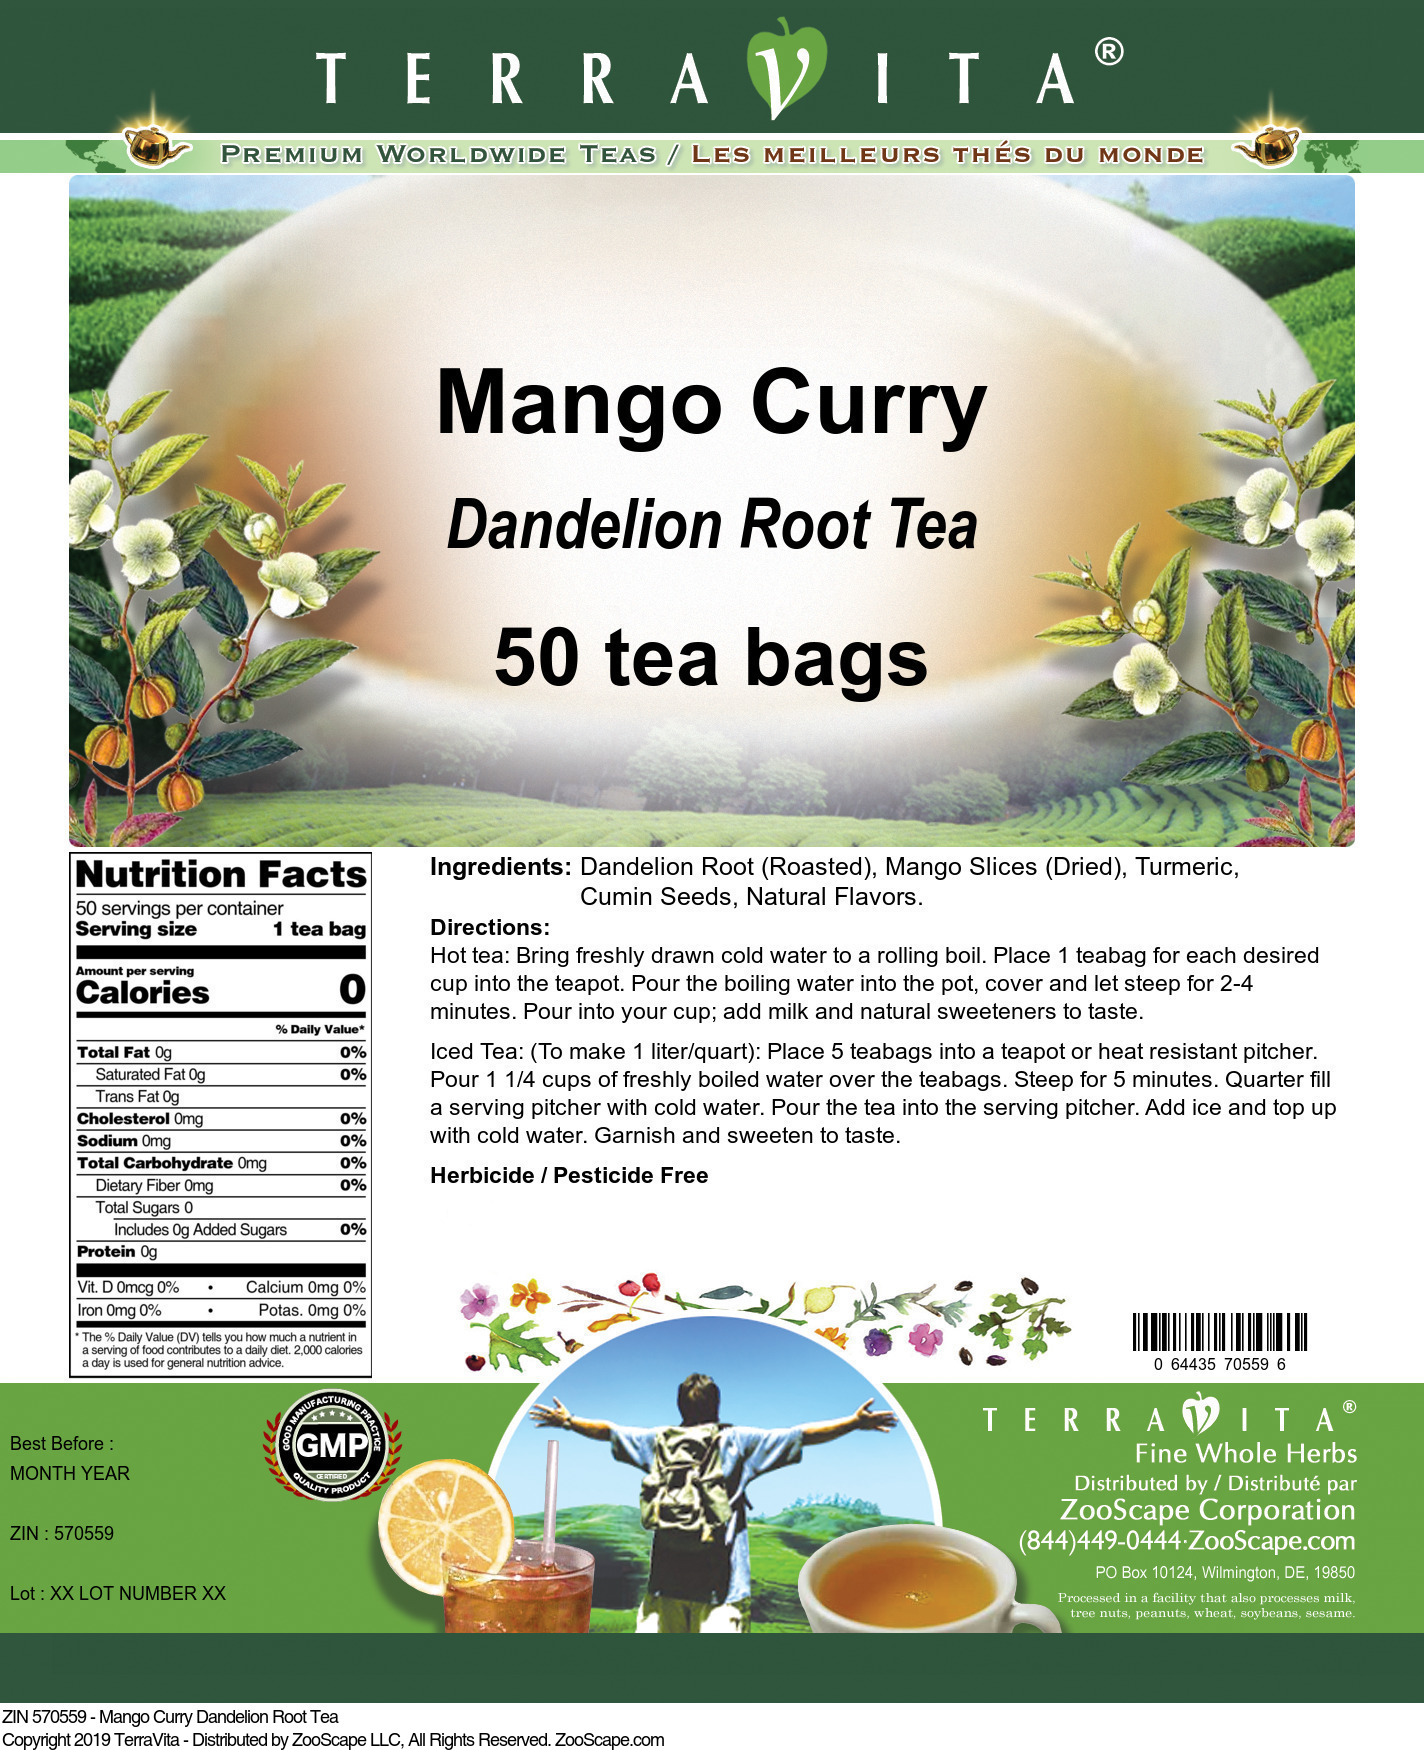 Mango Curry Dandelion Root